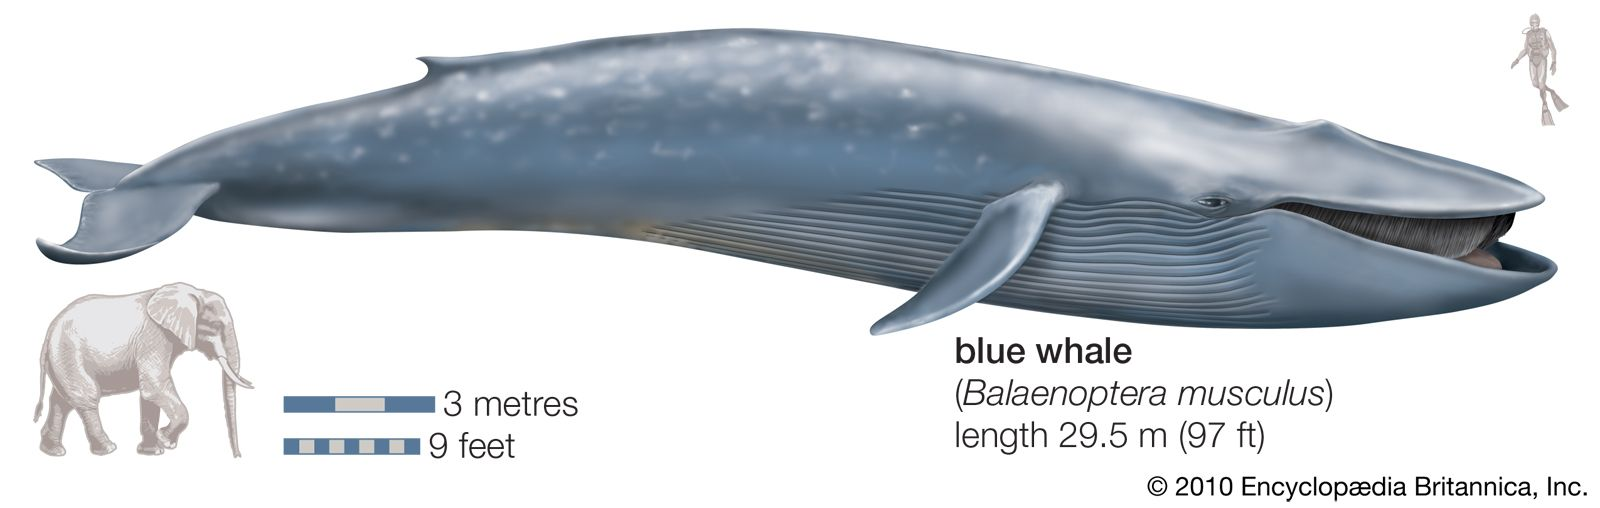 73257-050-7BA1BE72.jpg (1600×508)   Blue Whale   Pinterest   Ballena ...